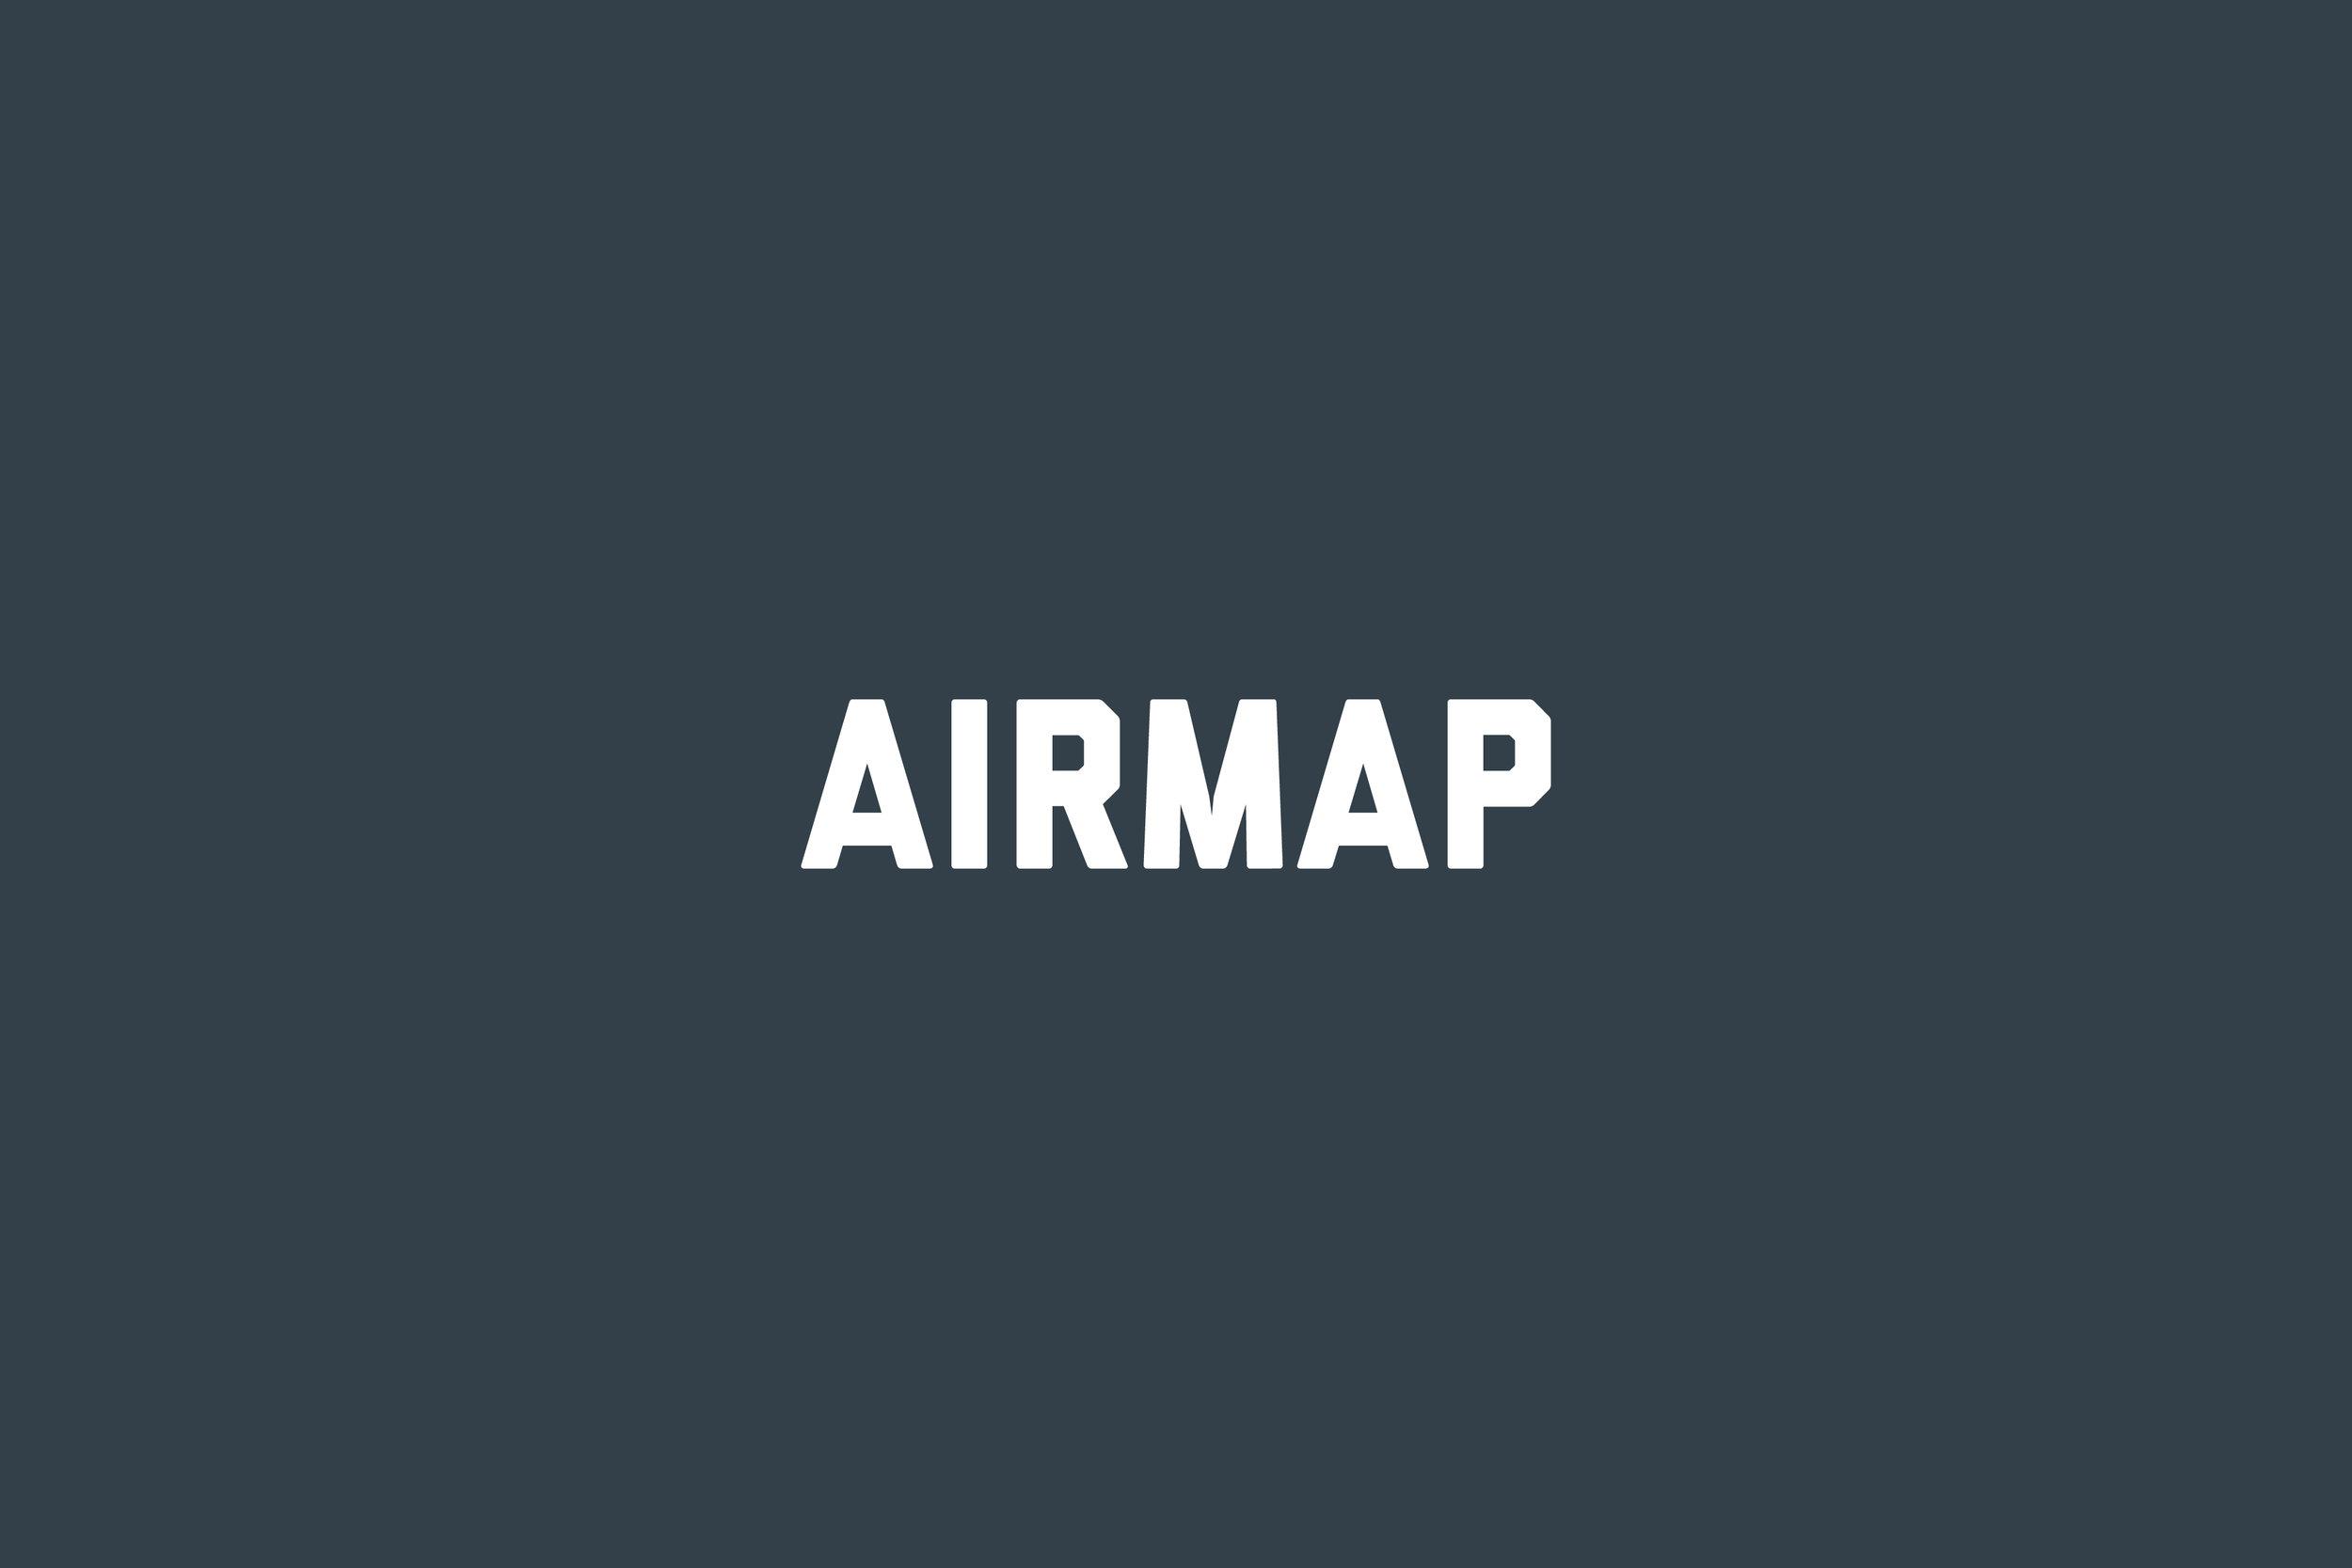 logos-thumbnail_airmap.jpg